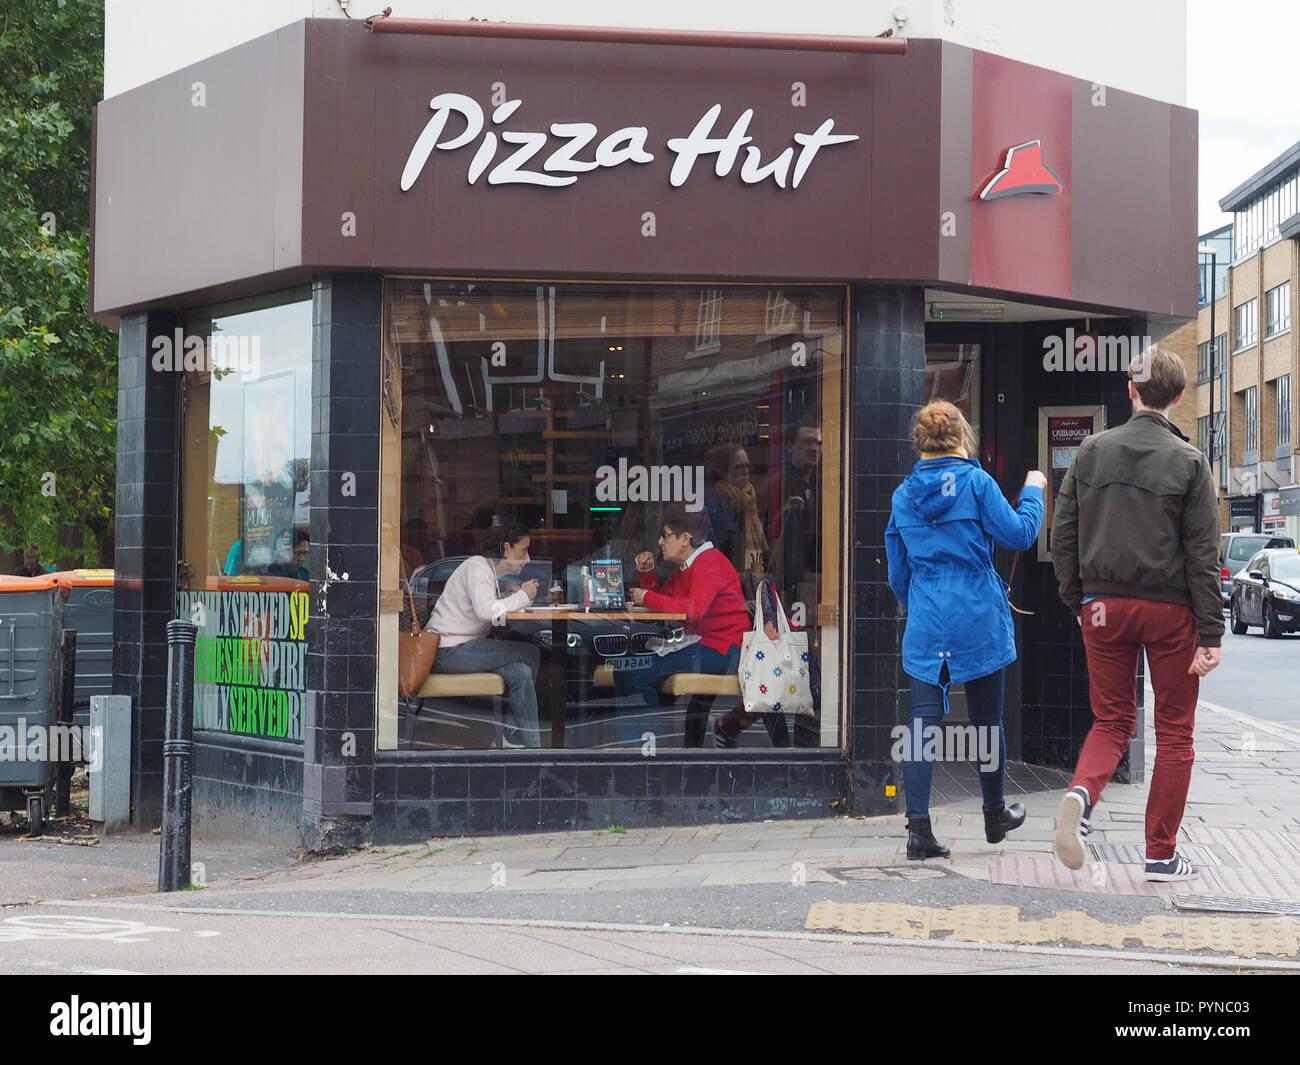 Pizza Hut Uk Stock Photos Pizza Hut Uk Stock Images Page